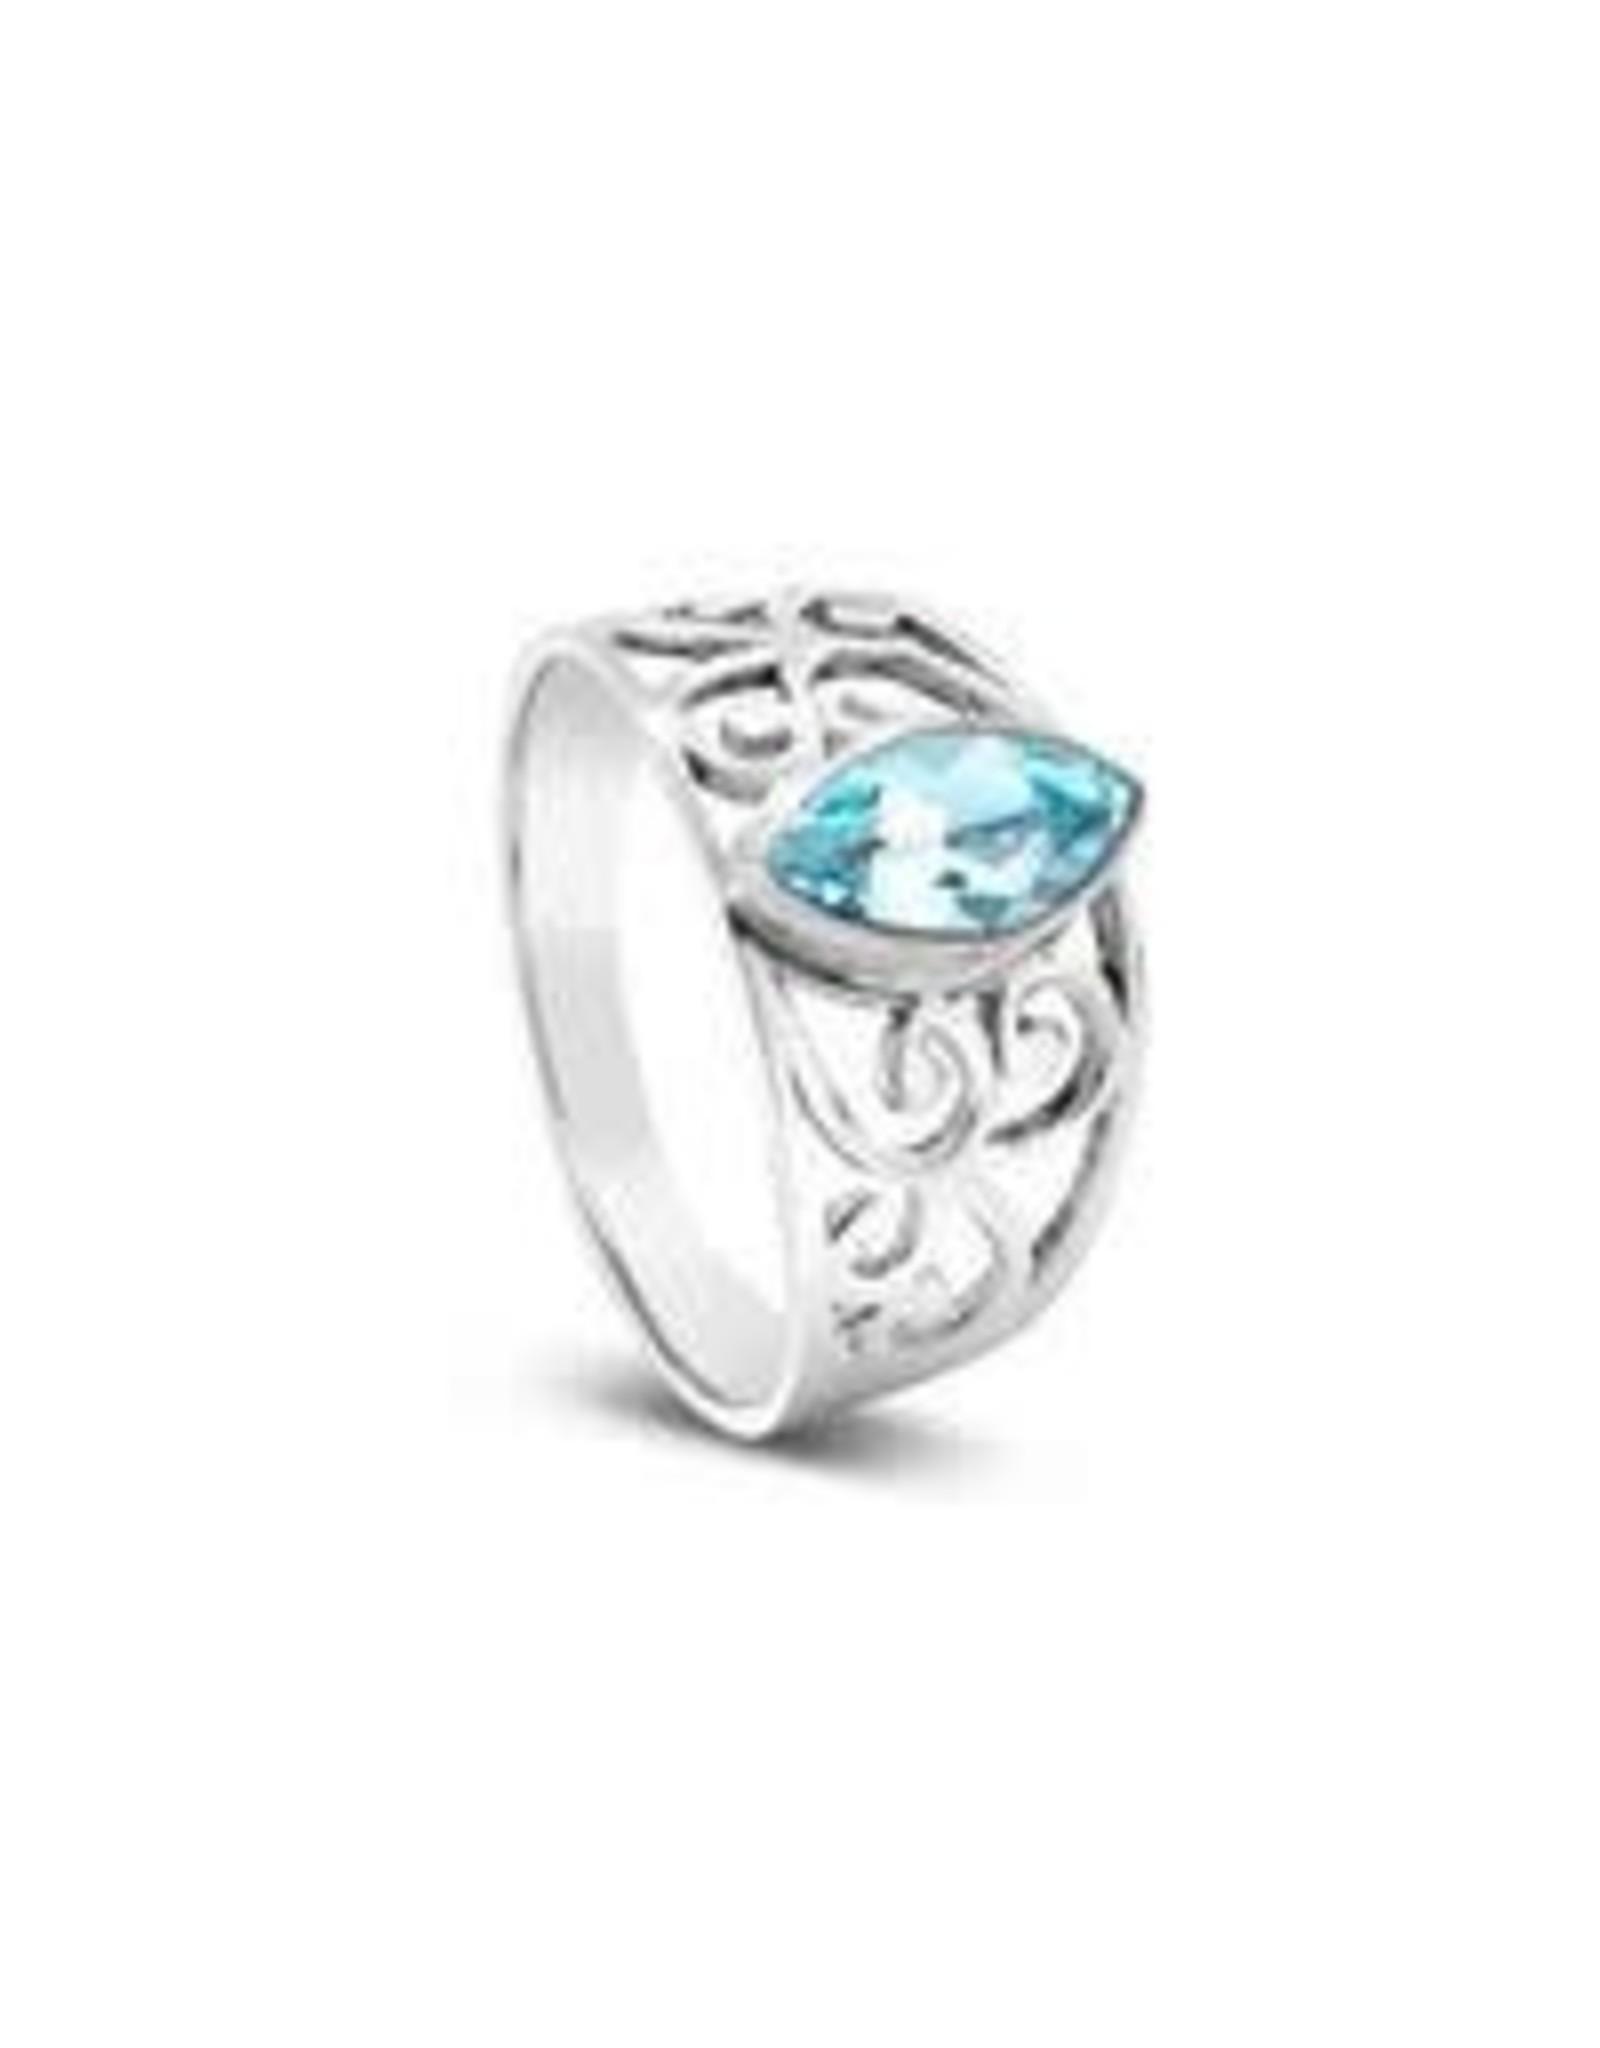 Stones & Silver Blue Topaz Ring 9mm x 7mm